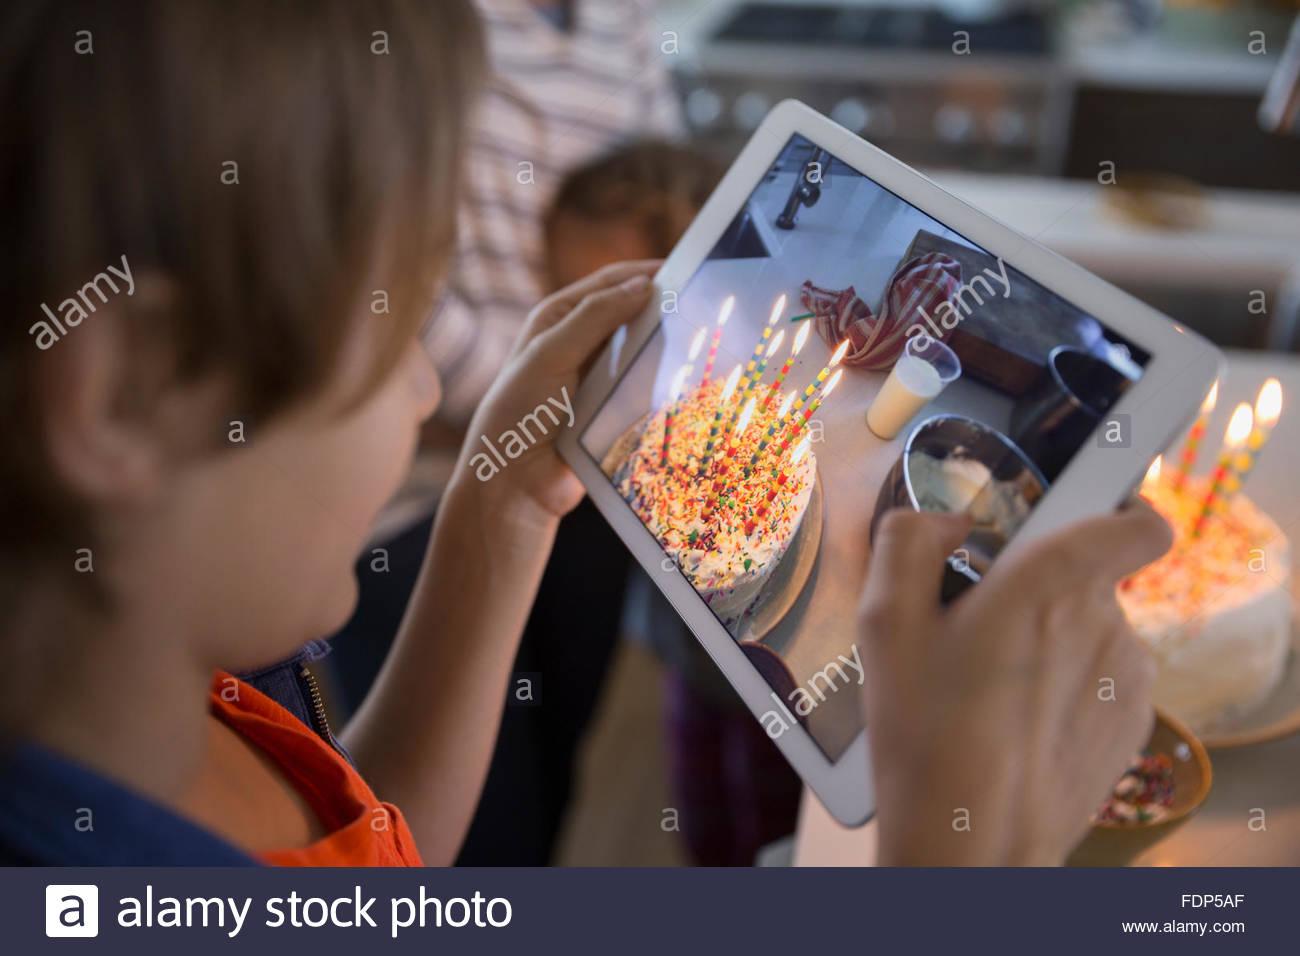 Junge fotografieren Geburtstagstorte mit Kerzen Stockbild